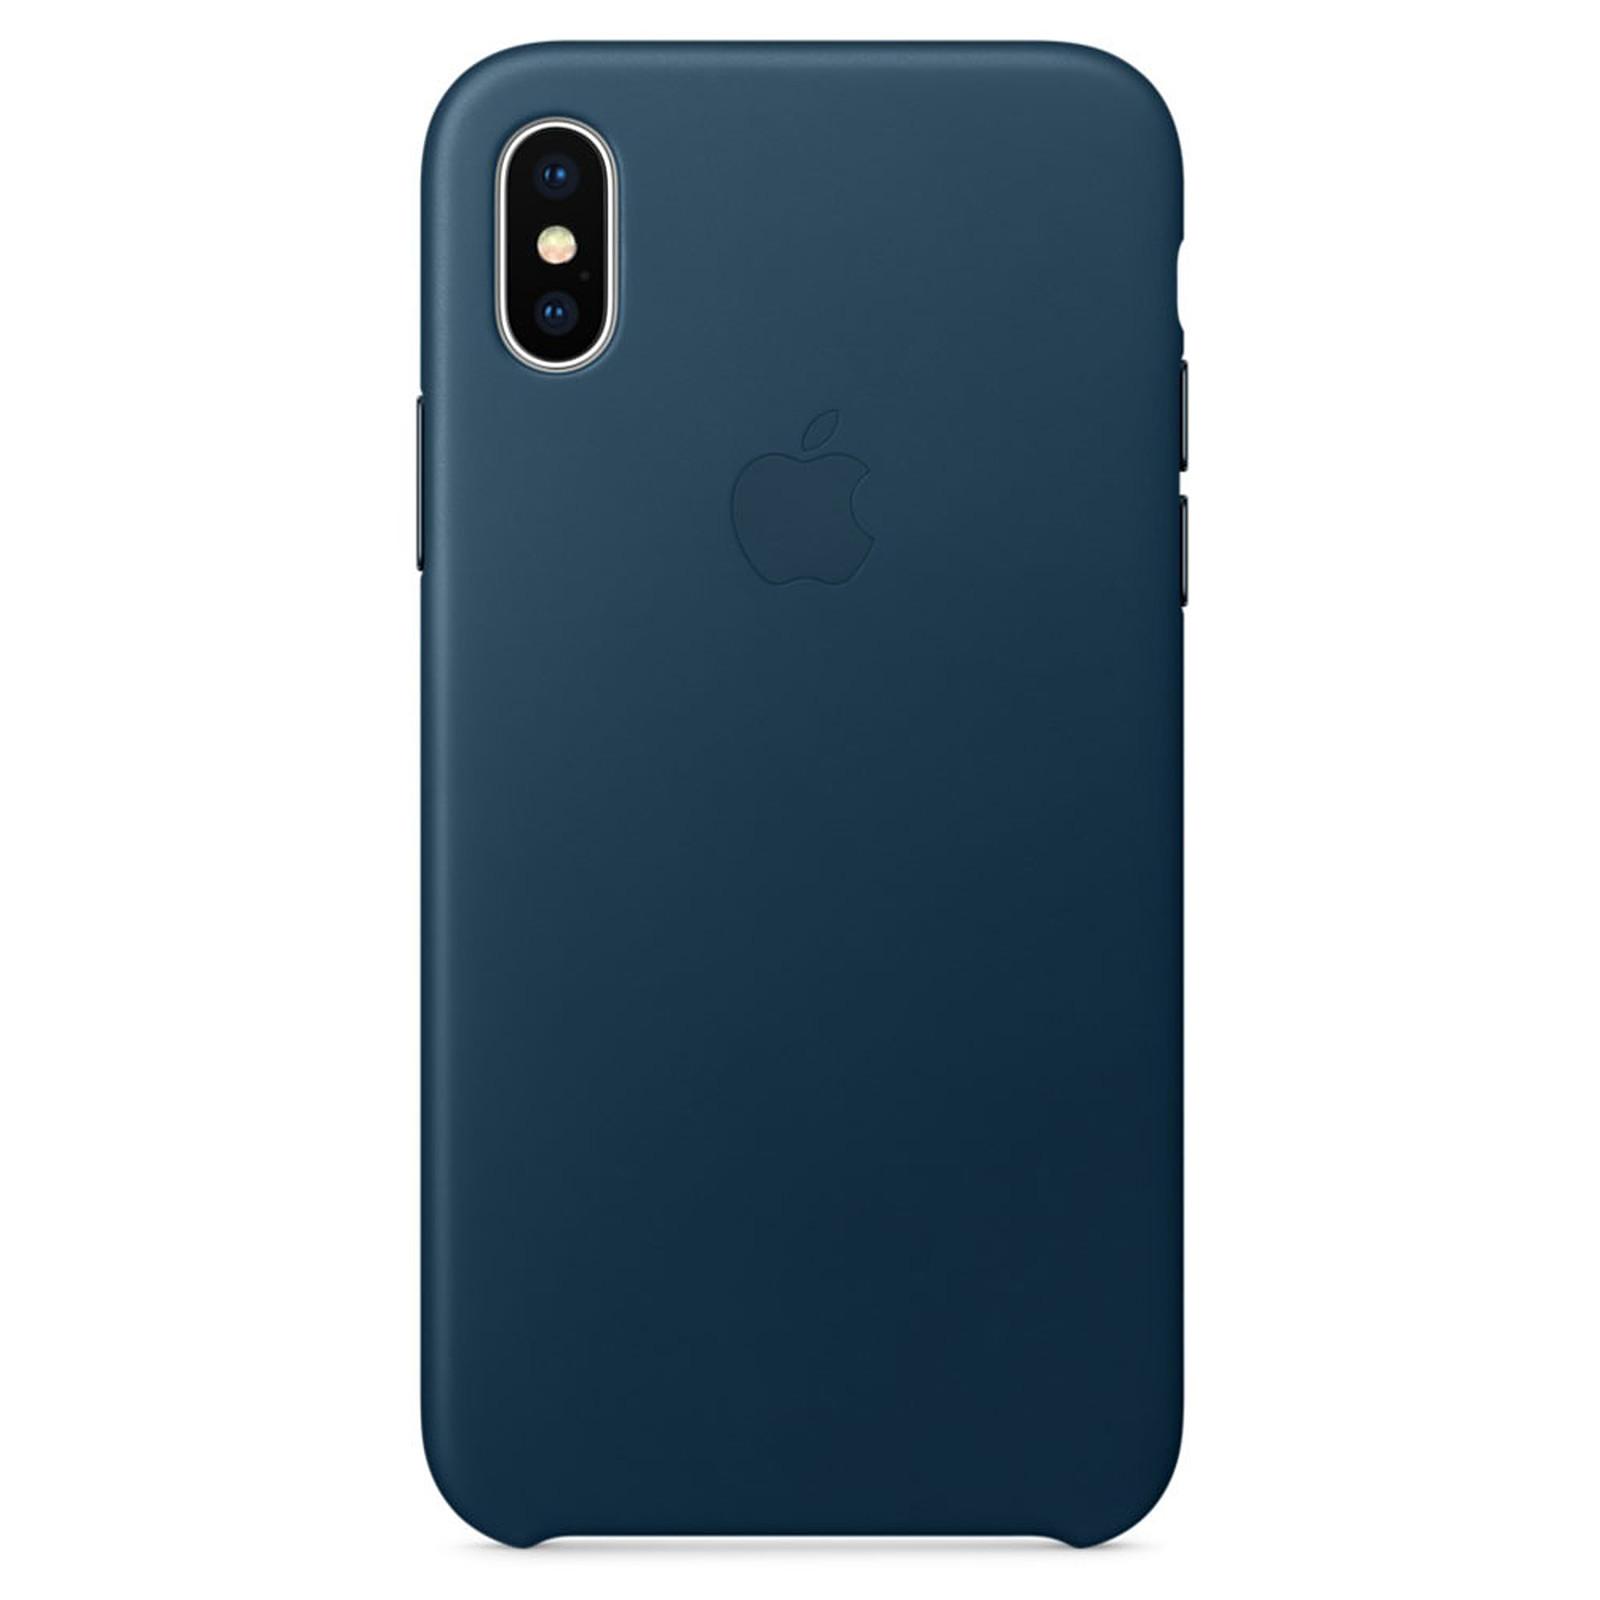 Apple Coque en cuir Bleu cosmos Apple iPhone X - Coque téléphone ...